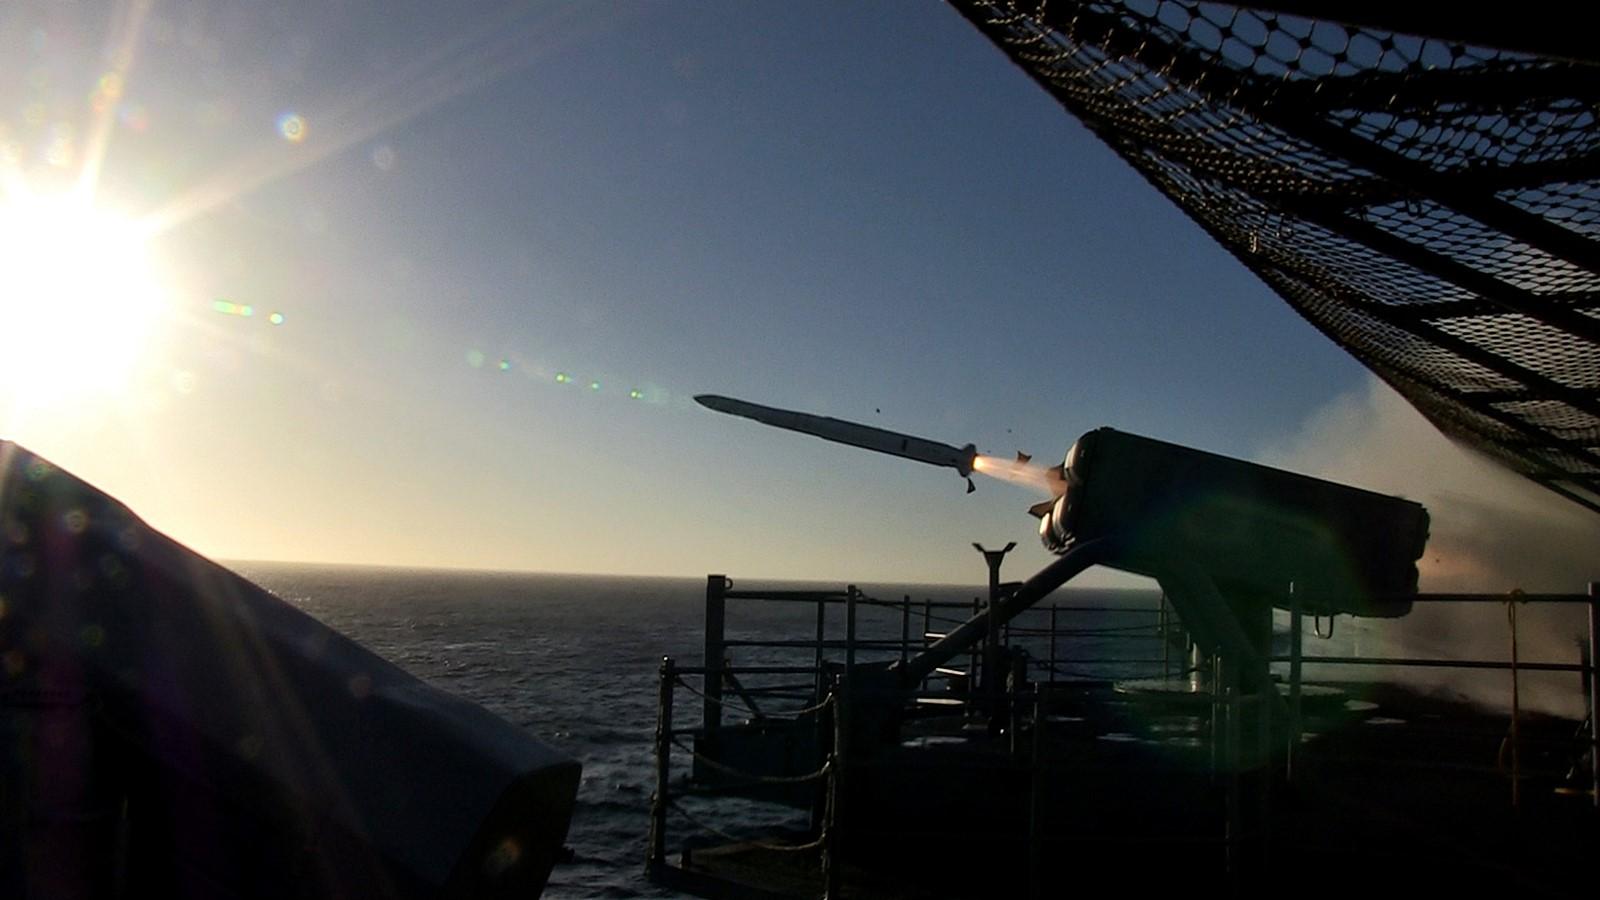 ESSM 미사일 발사하는 미 신형상륙함 USS Americ..